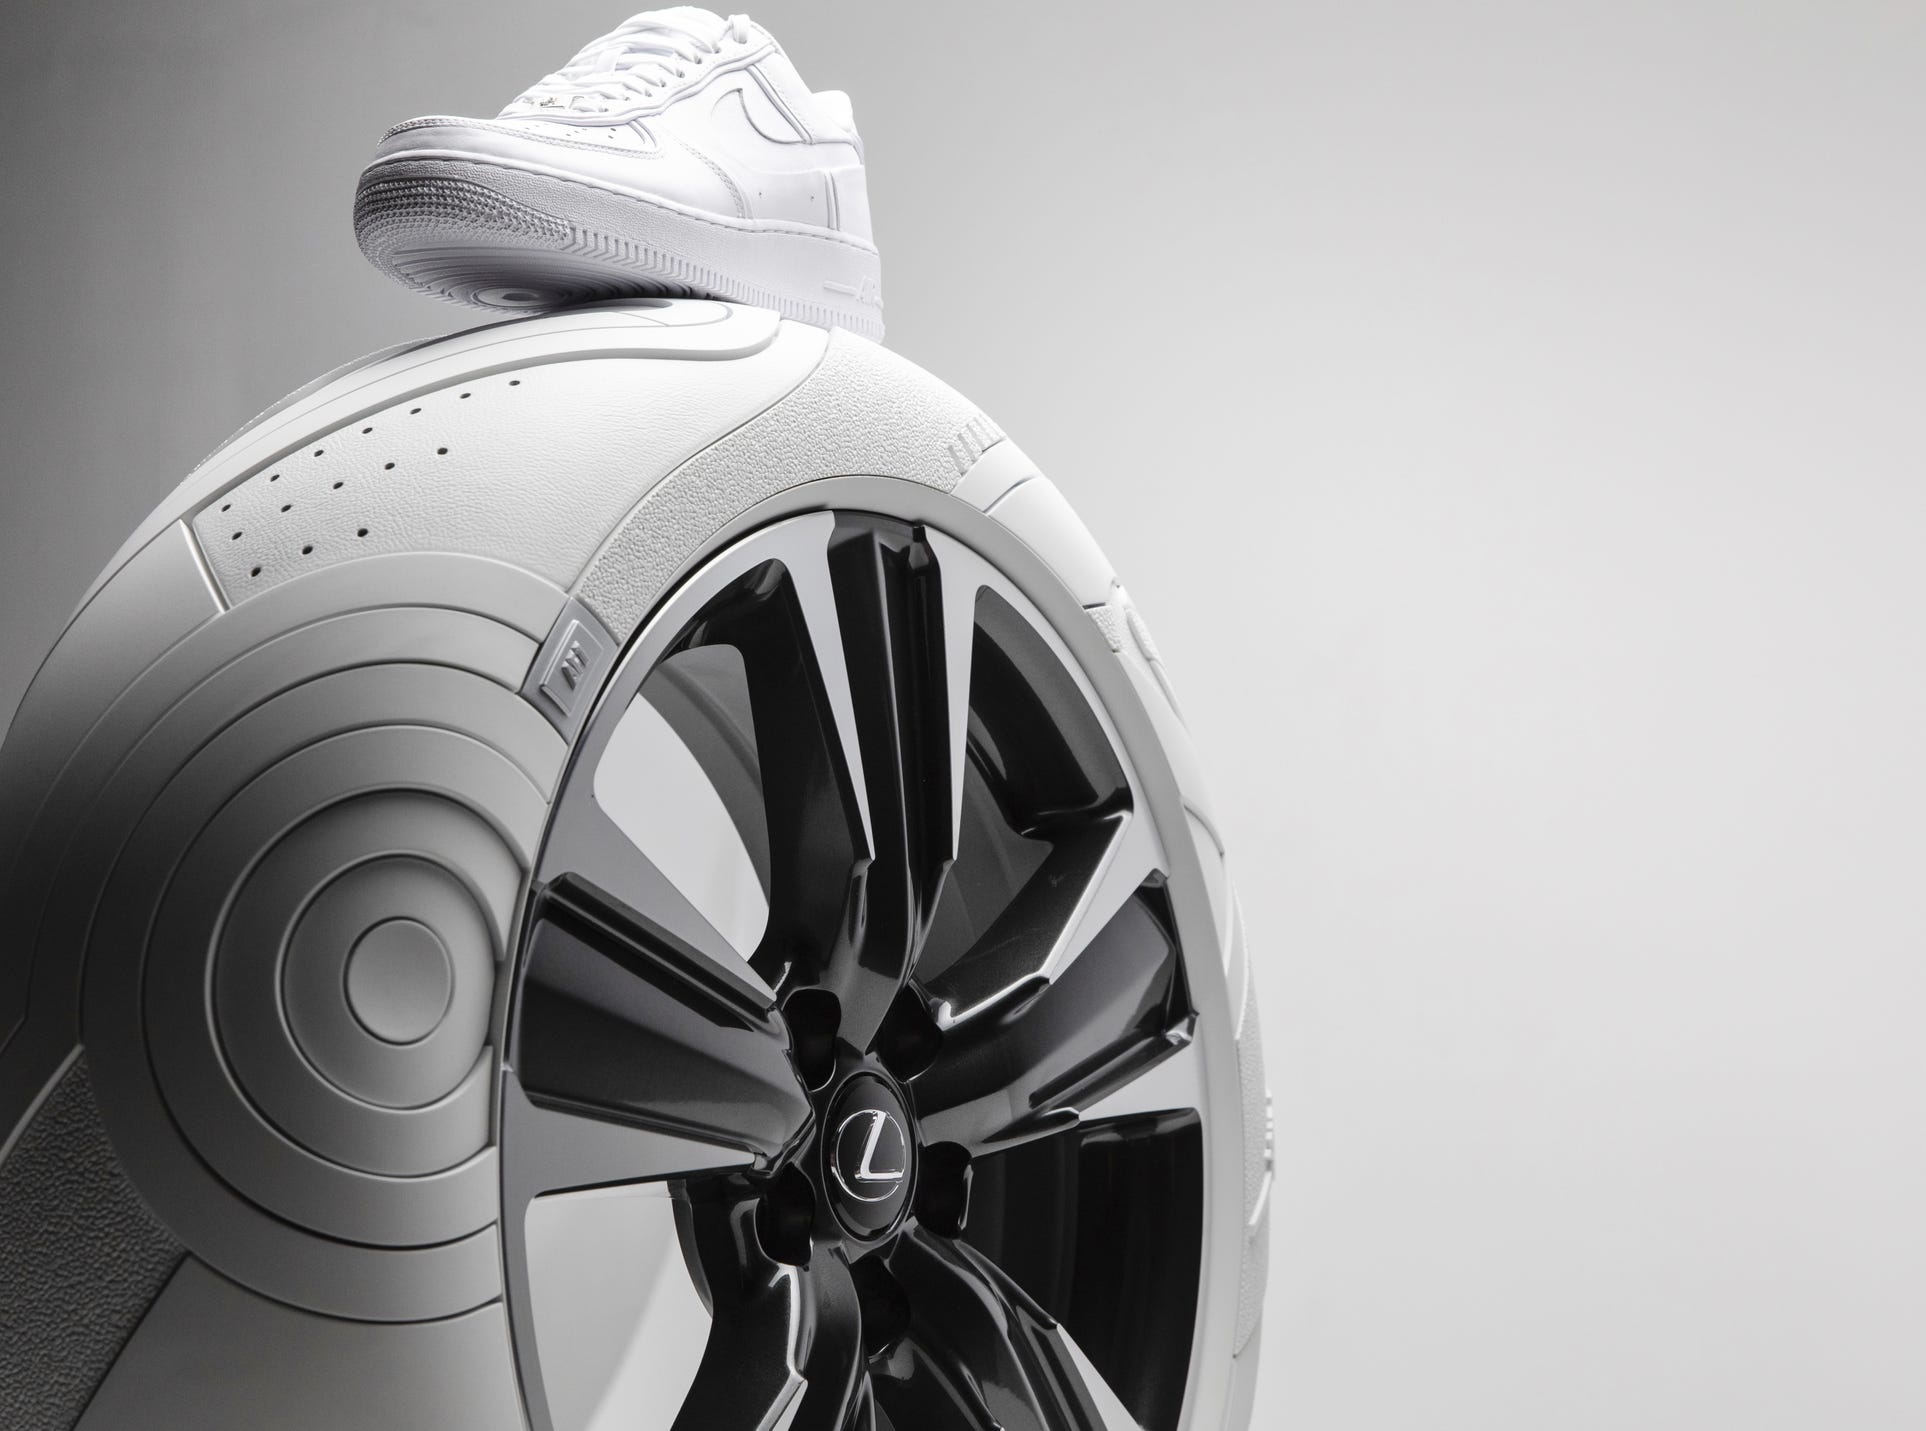 Nike's Air Force 1 sneaker atop Lexus UX custom tires